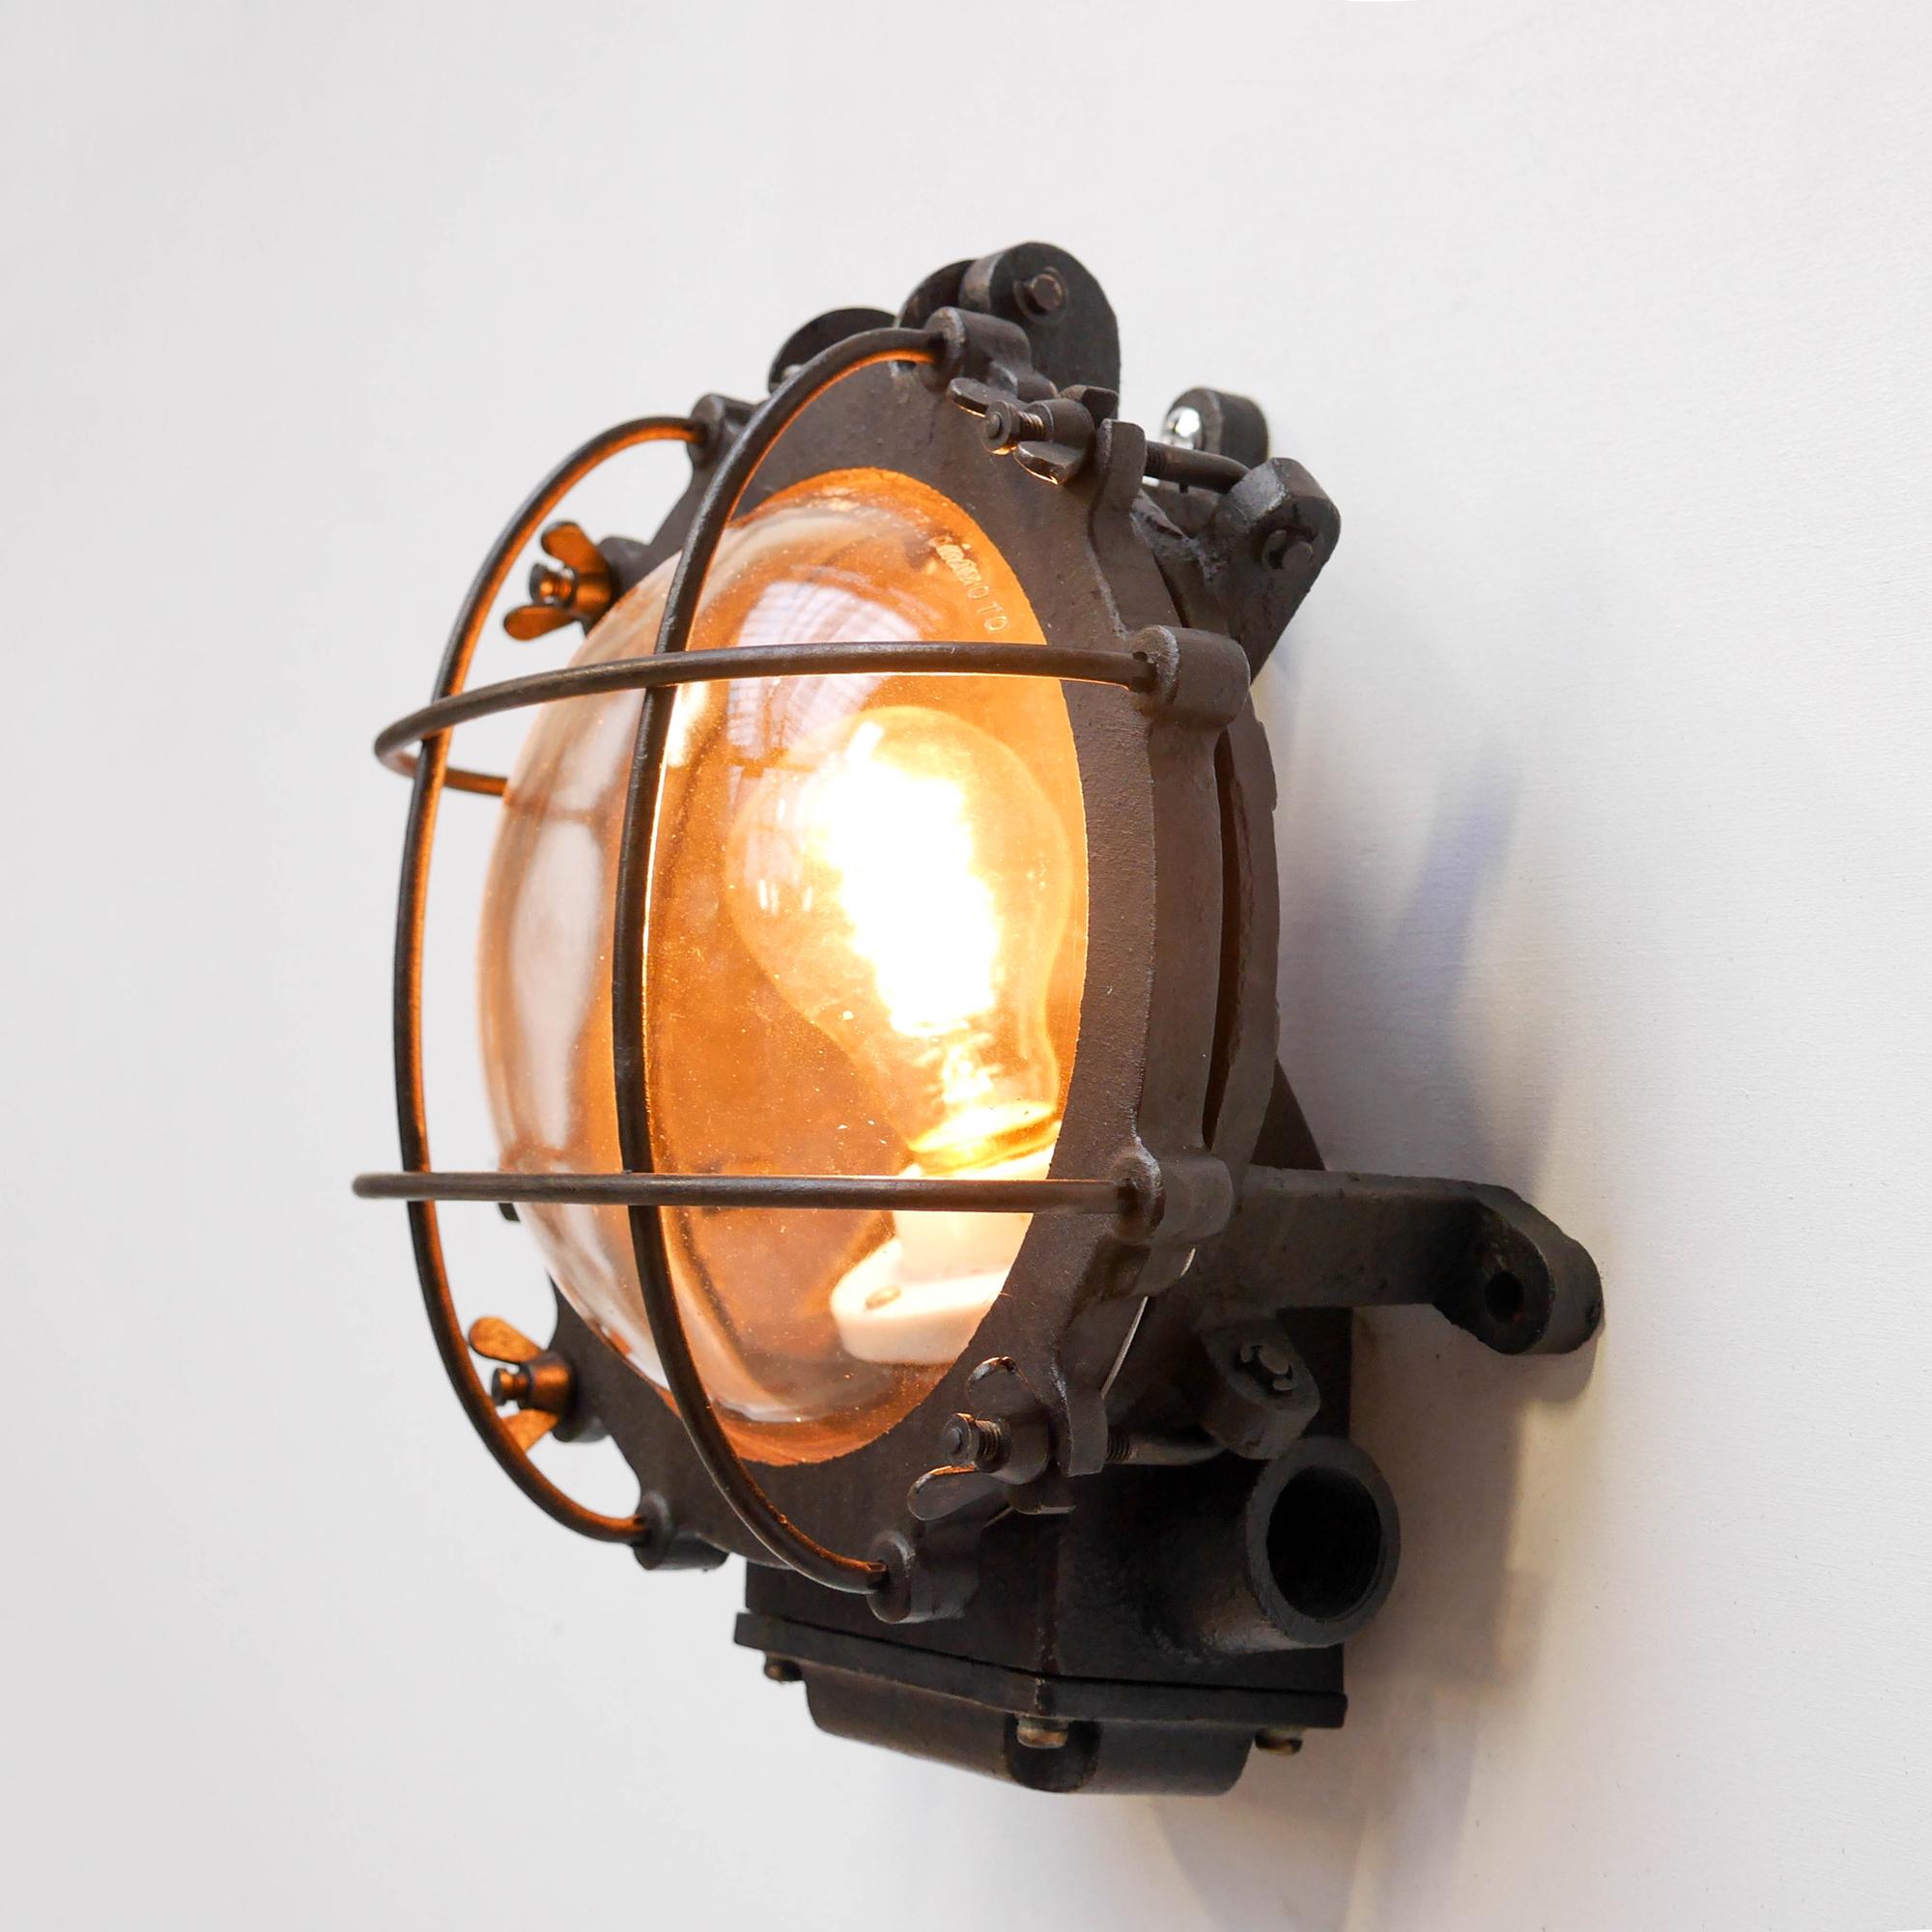 applique ronde grillag e fonte d 39 acier patin e anciellitude anciellitude. Black Bedroom Furniture Sets. Home Design Ideas